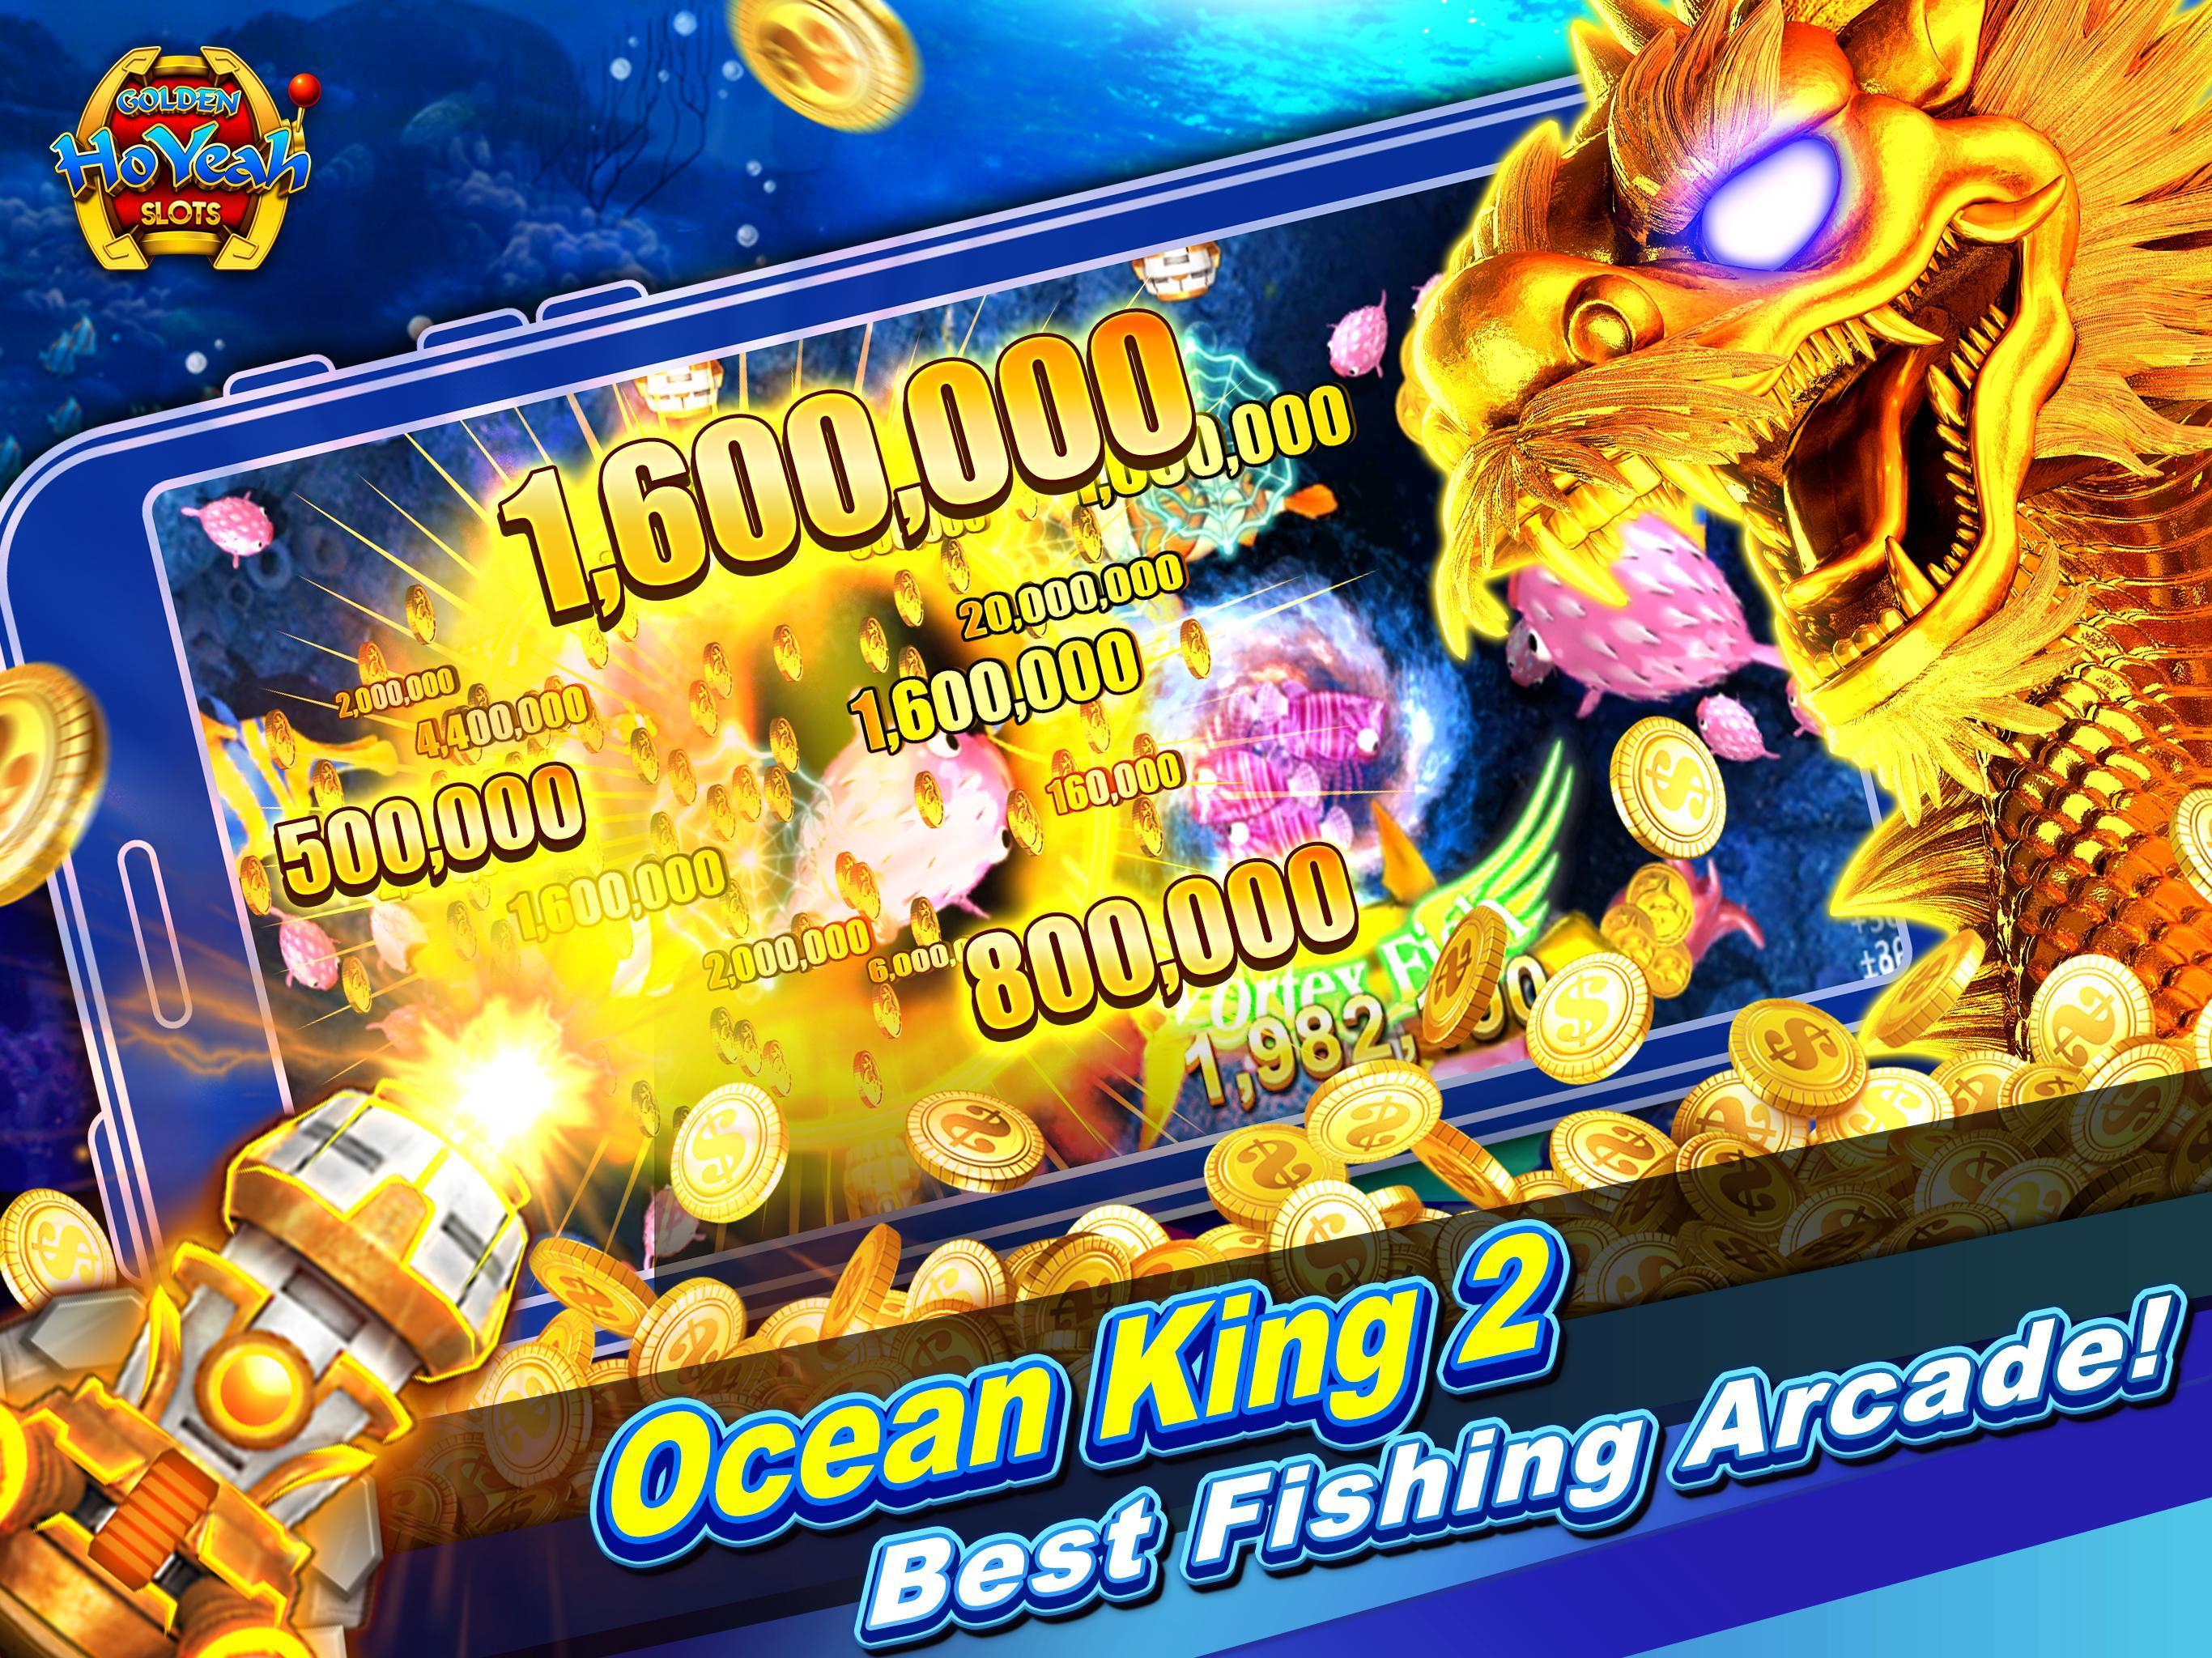 Slots (Golden HoYeah) - Casino Slots 2.5.7 Screenshot 9